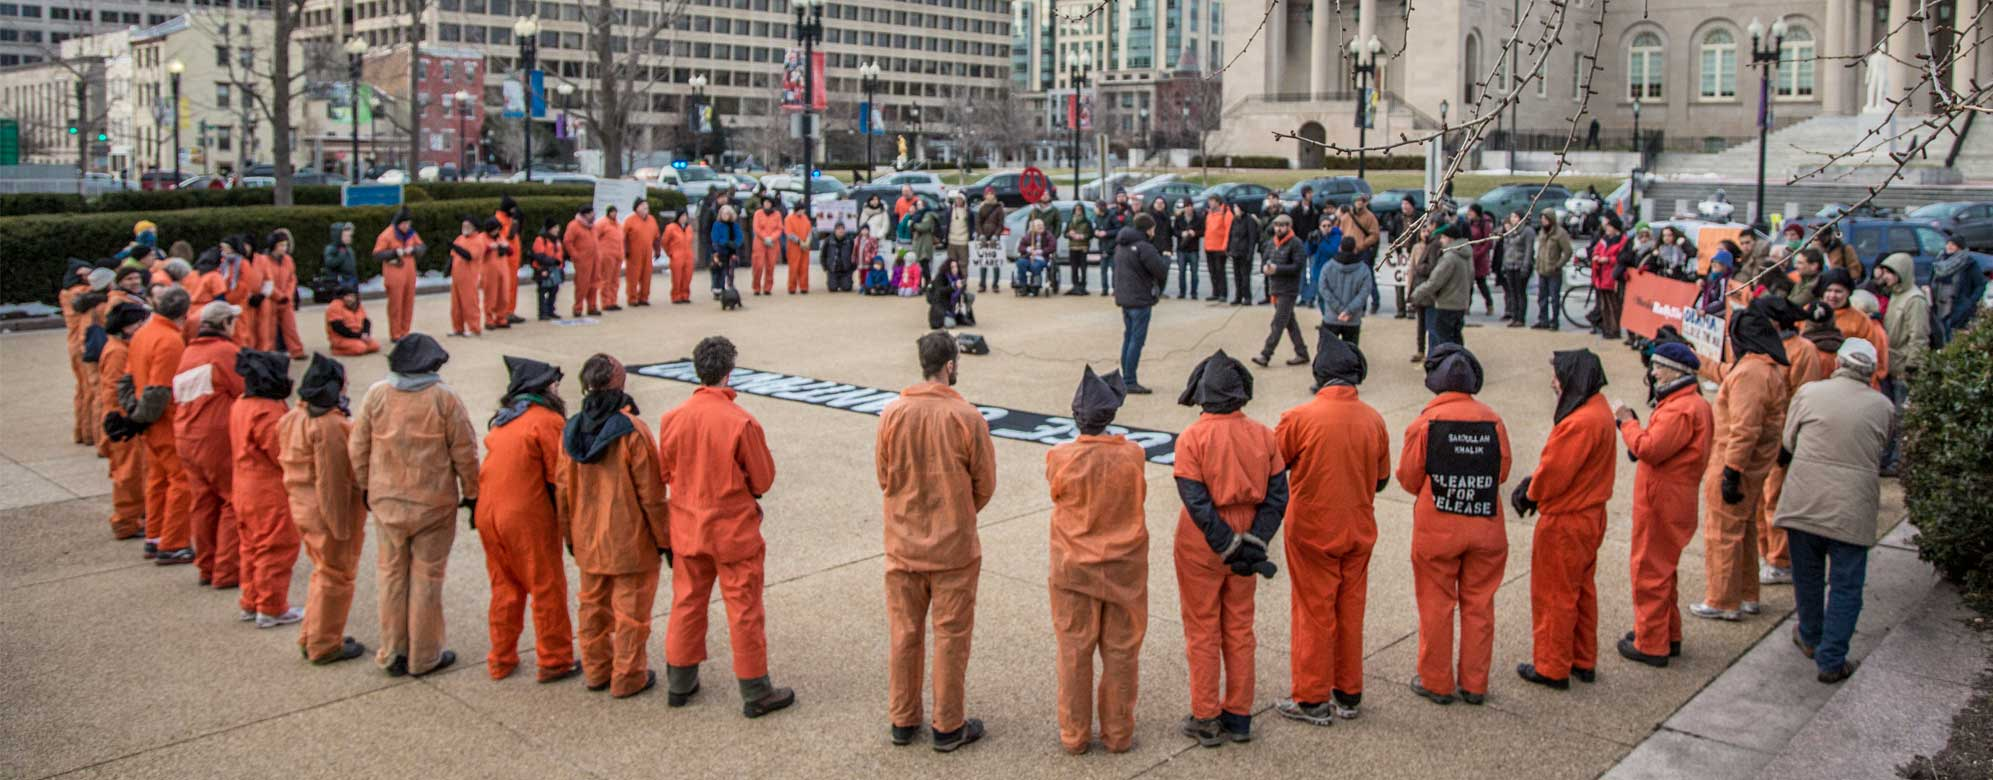 Witness Against Torture Activist Circle